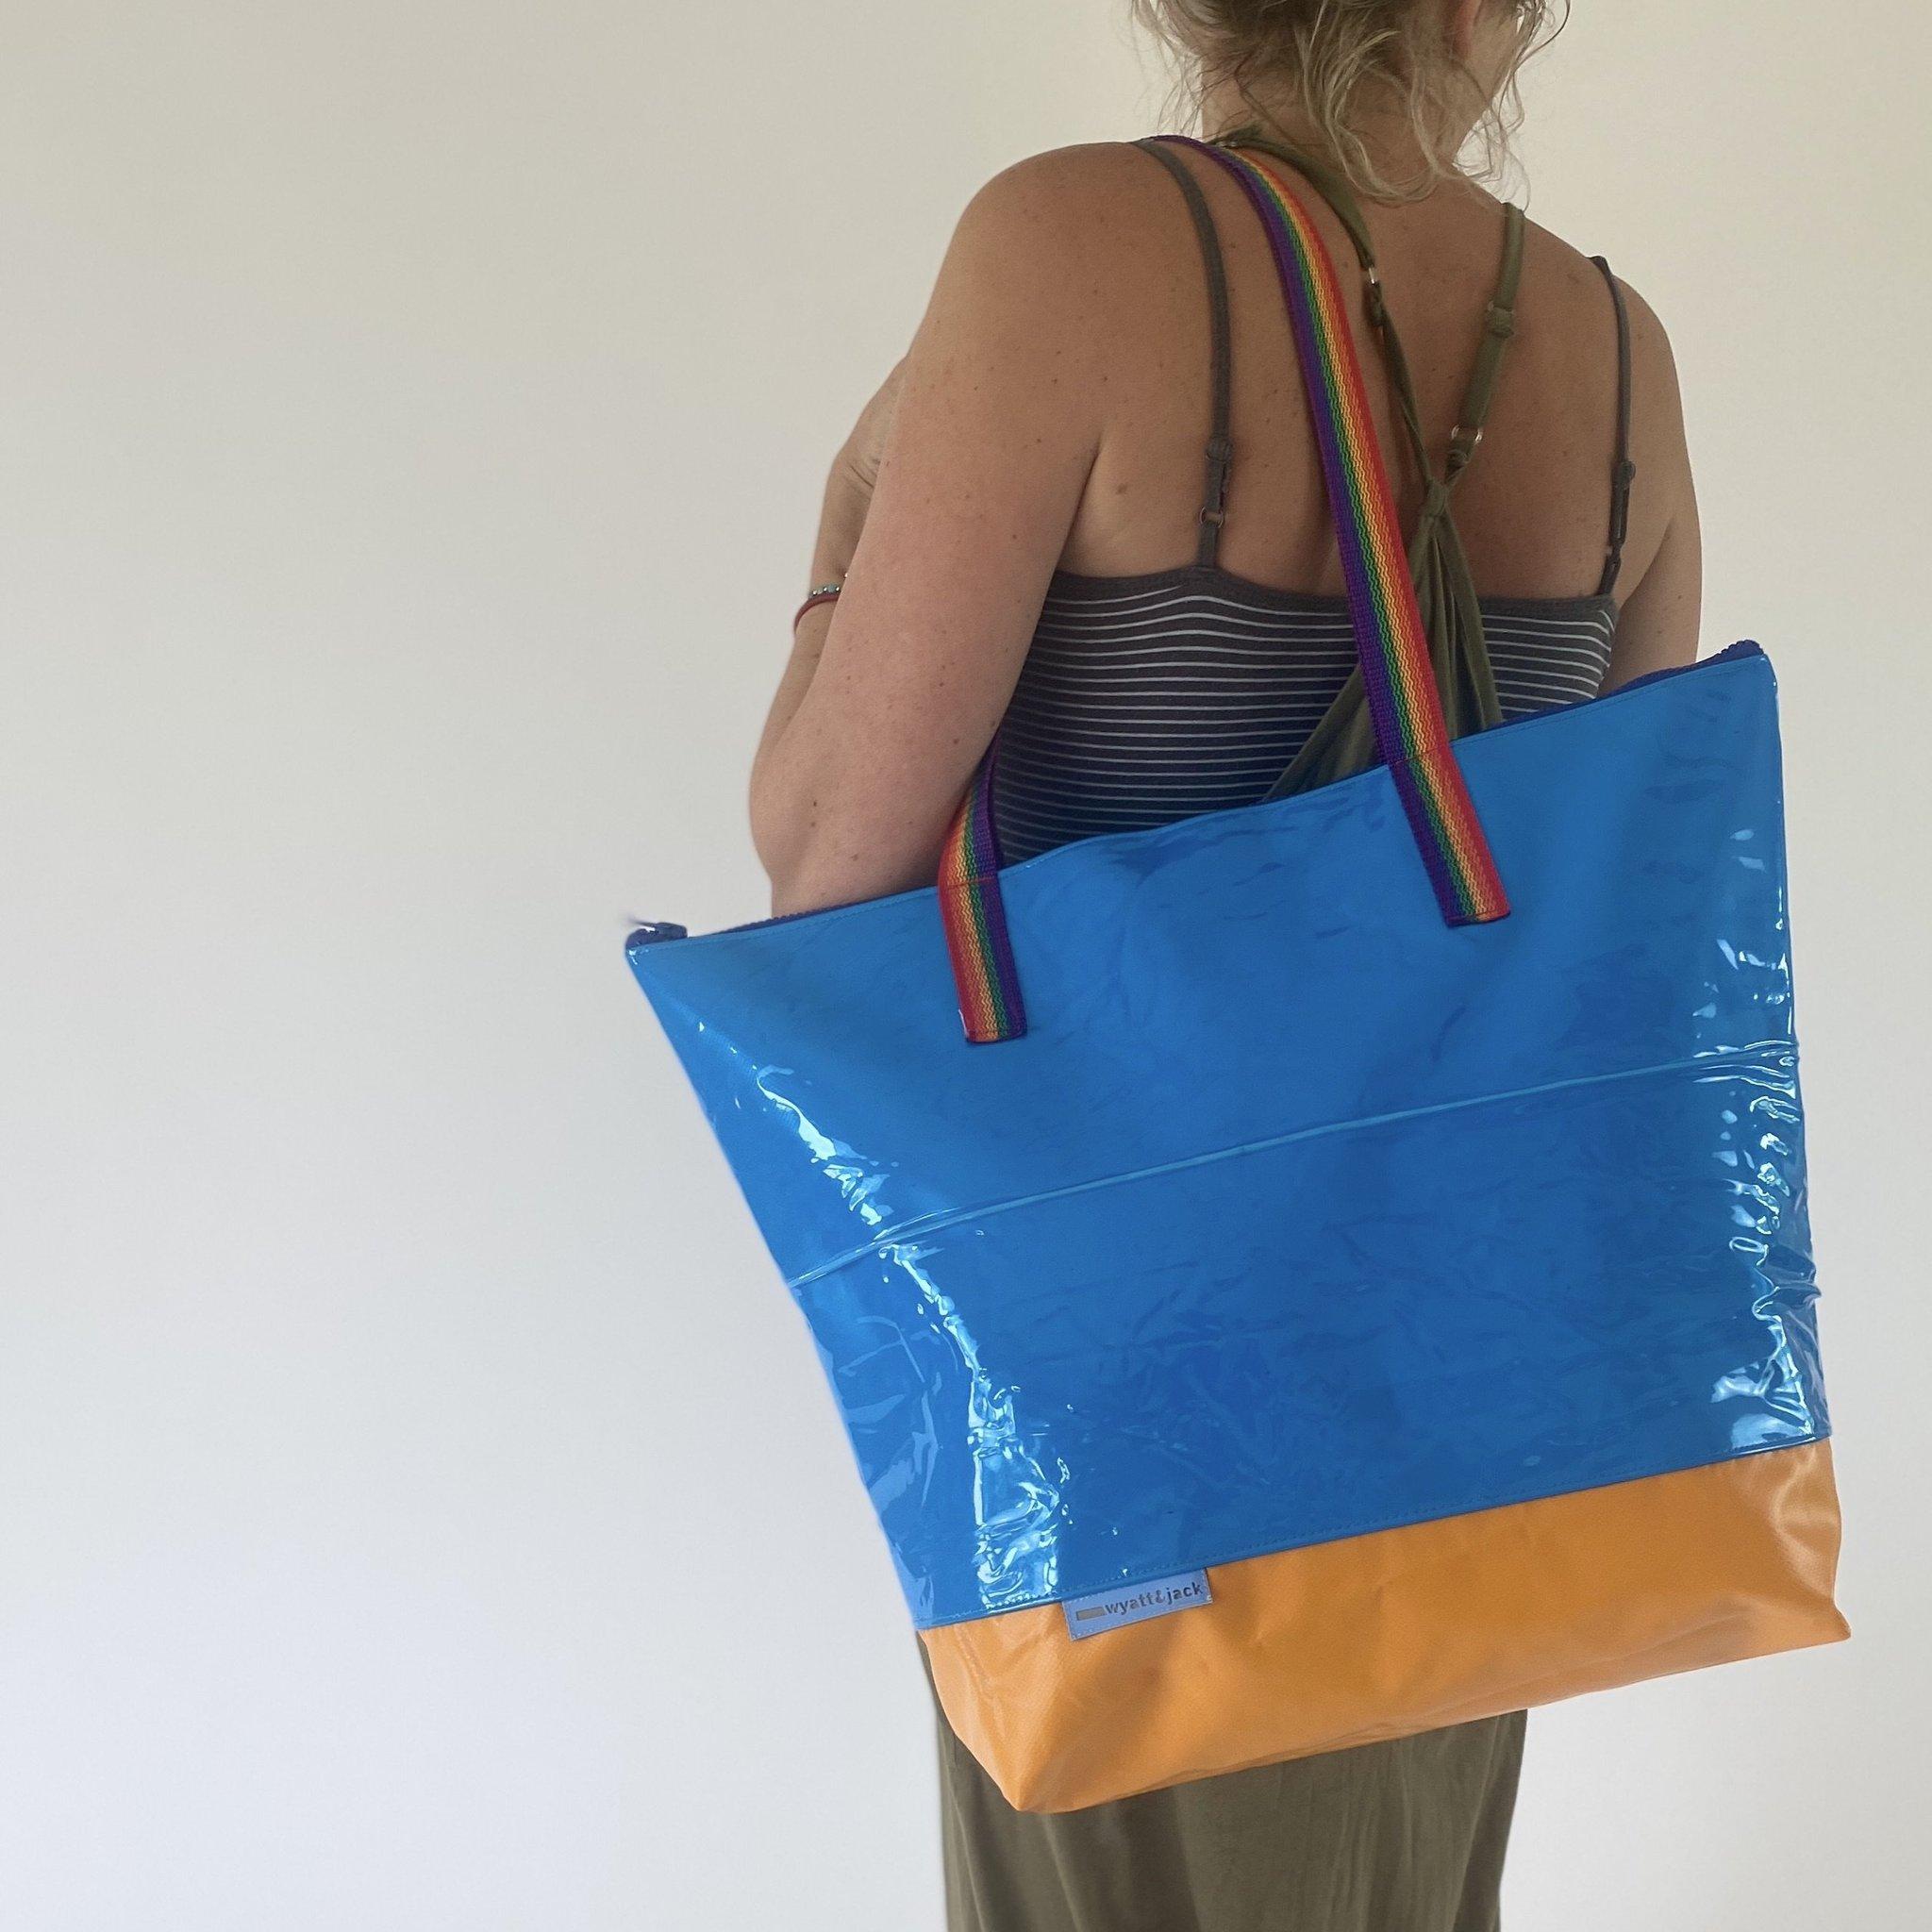 Ex Inflatable XL Tote Bag   Wyatt & Jack